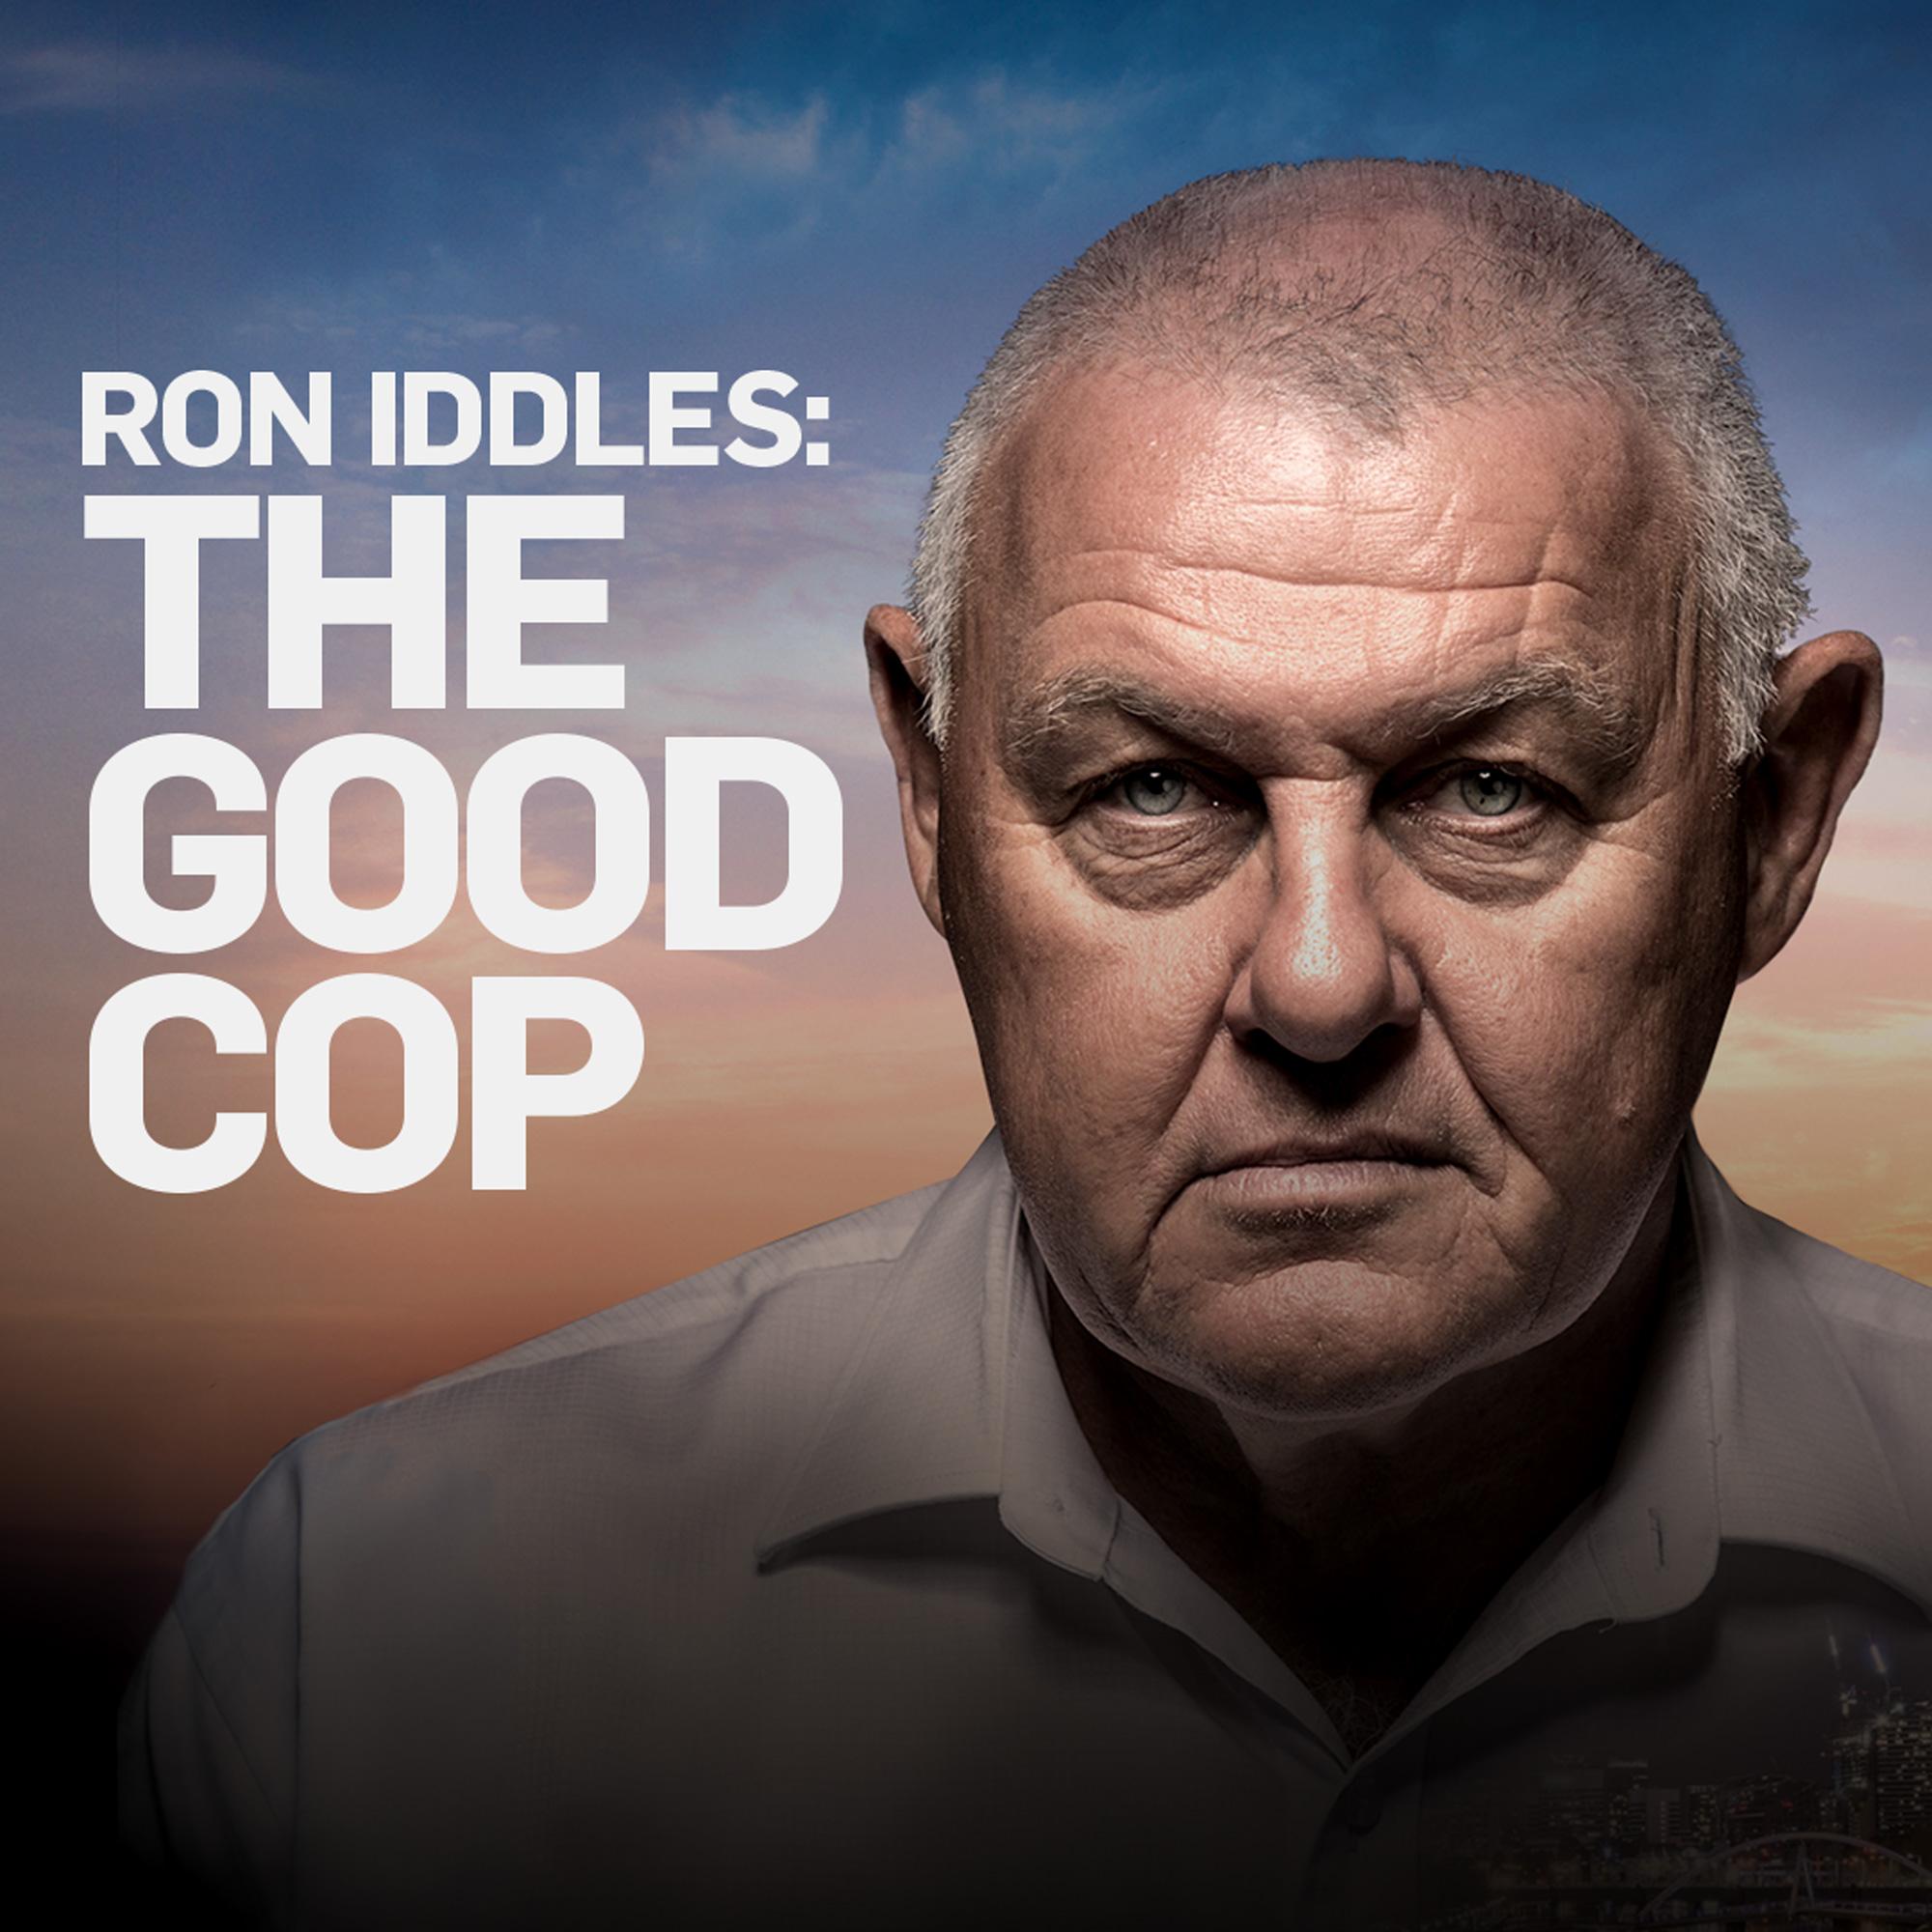 Ron Iddles: The Good Cop Trailer